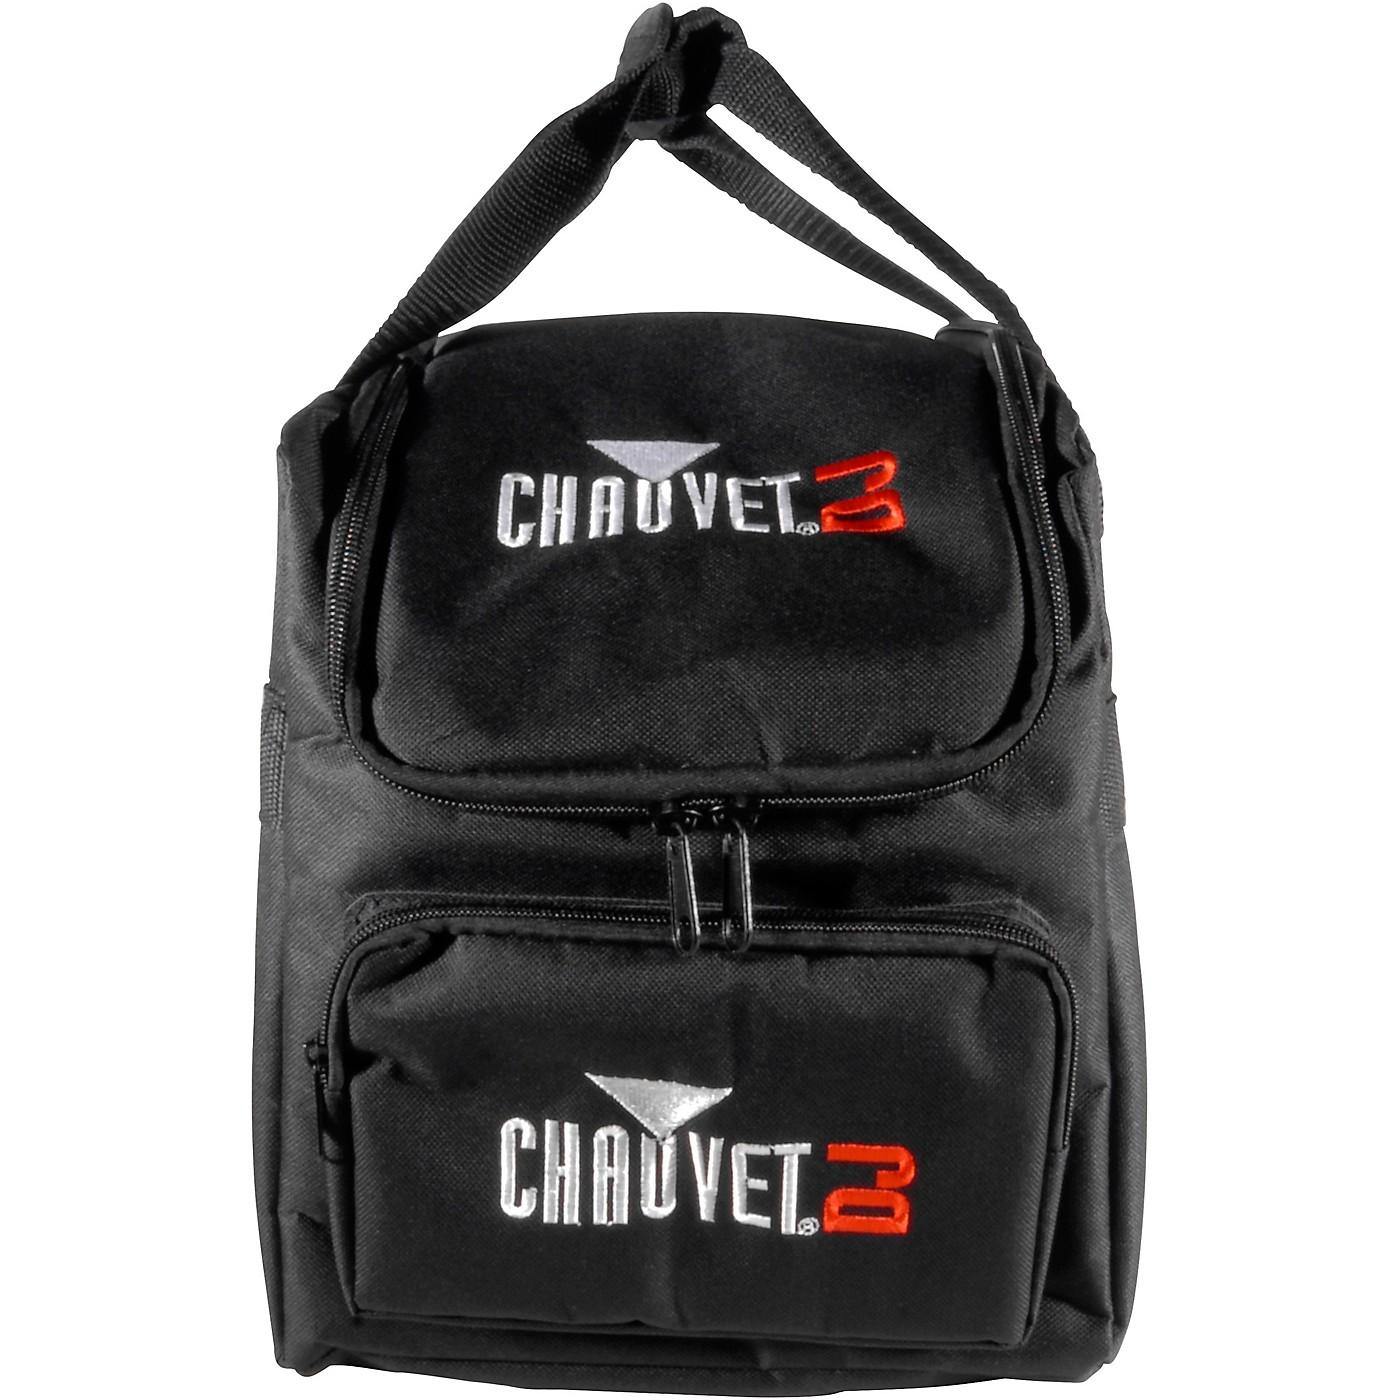 CHAUVET DJ CHS-25 SlimPAR 64 VIP Gear/Travel Bag thumbnail